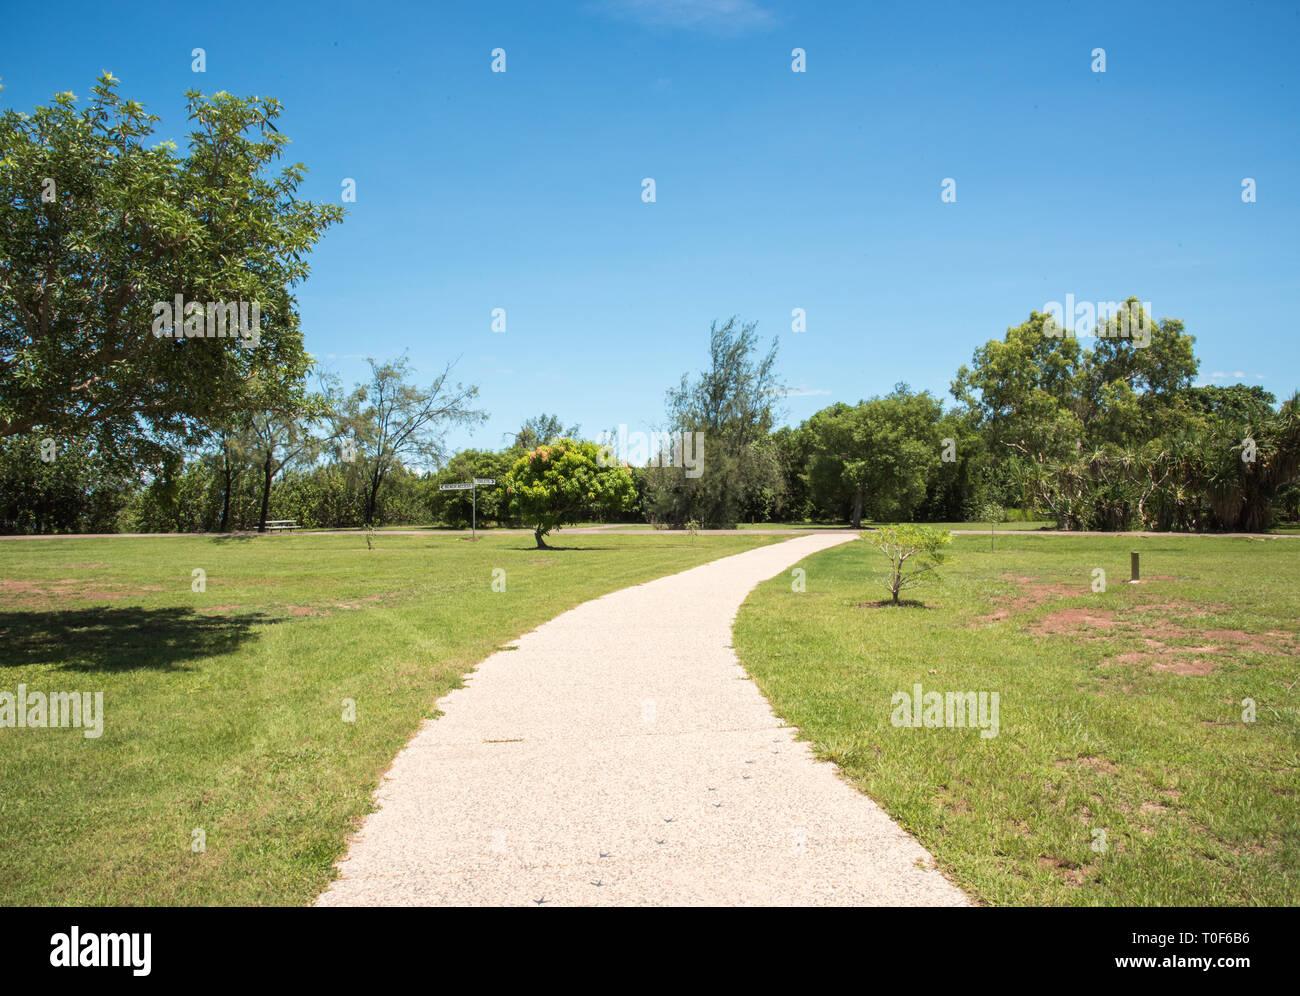 with path at the Casuarina Coastal Reserve public park in Casuarina, Australia - Stock Image